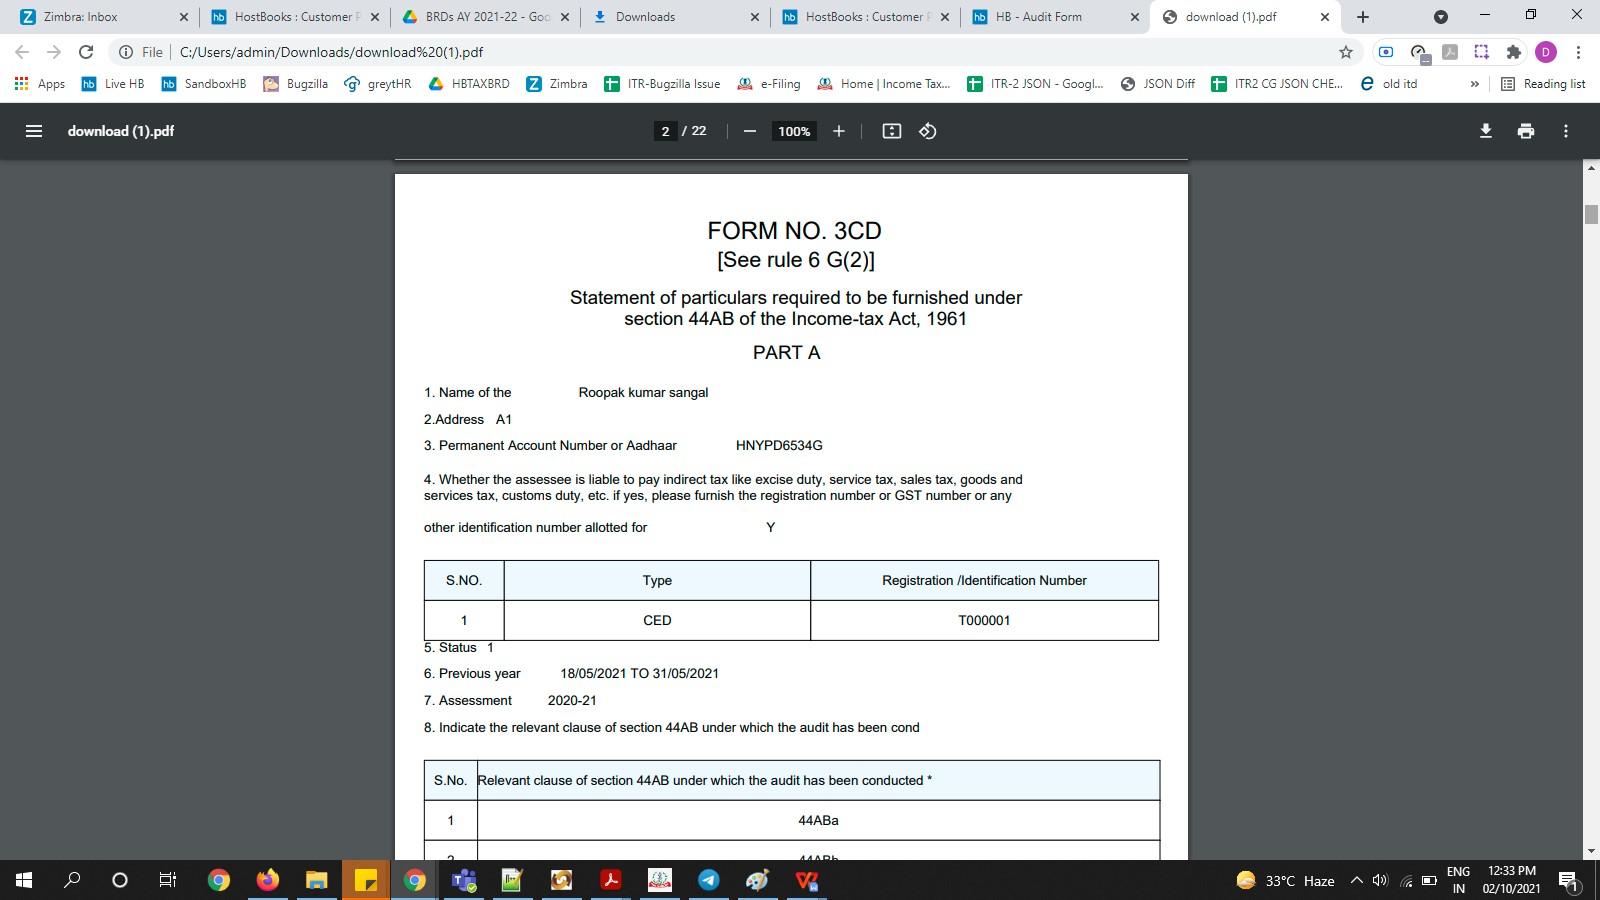 3cb-3cd-pdf-report-two